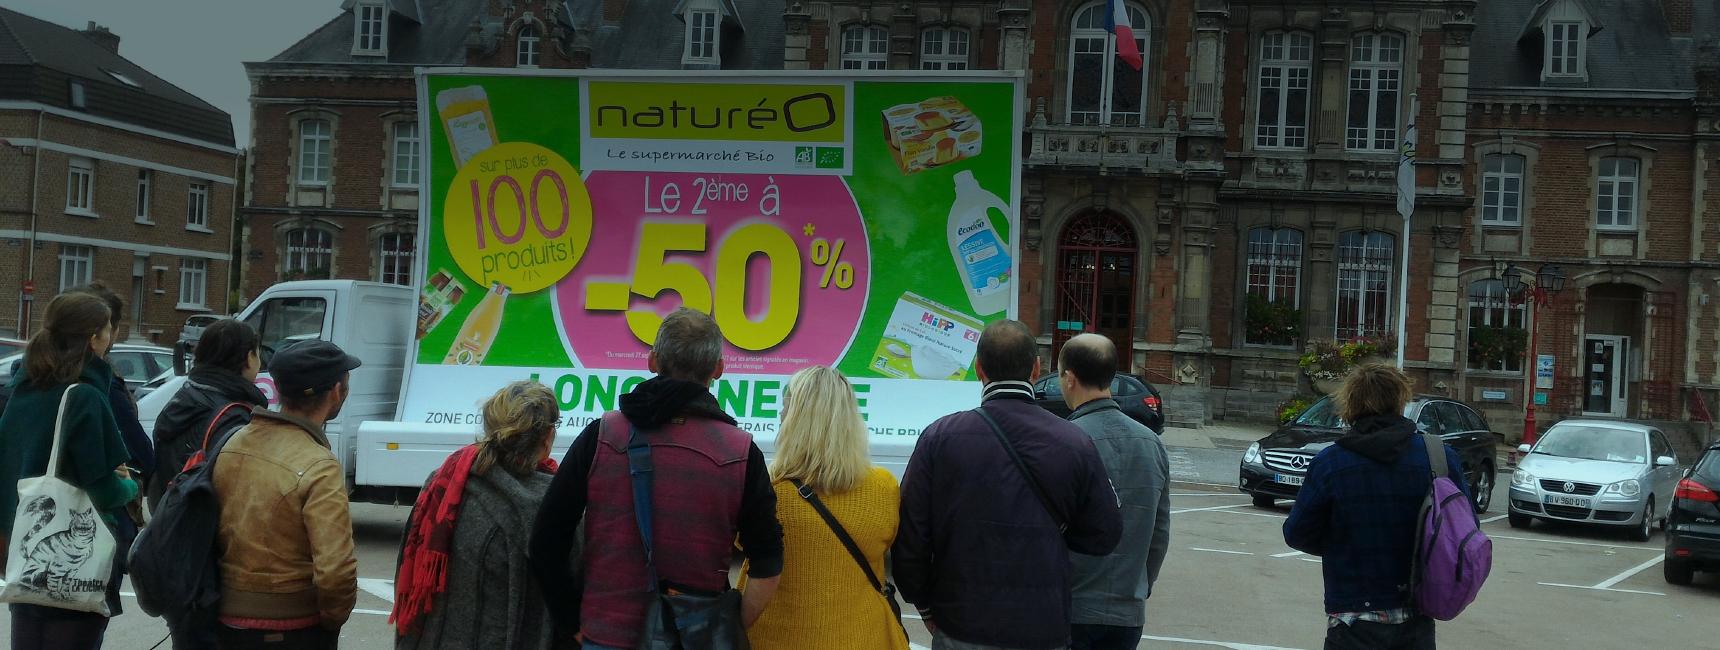 natureo - affichage mobile - Keemia agence marketing local Paris